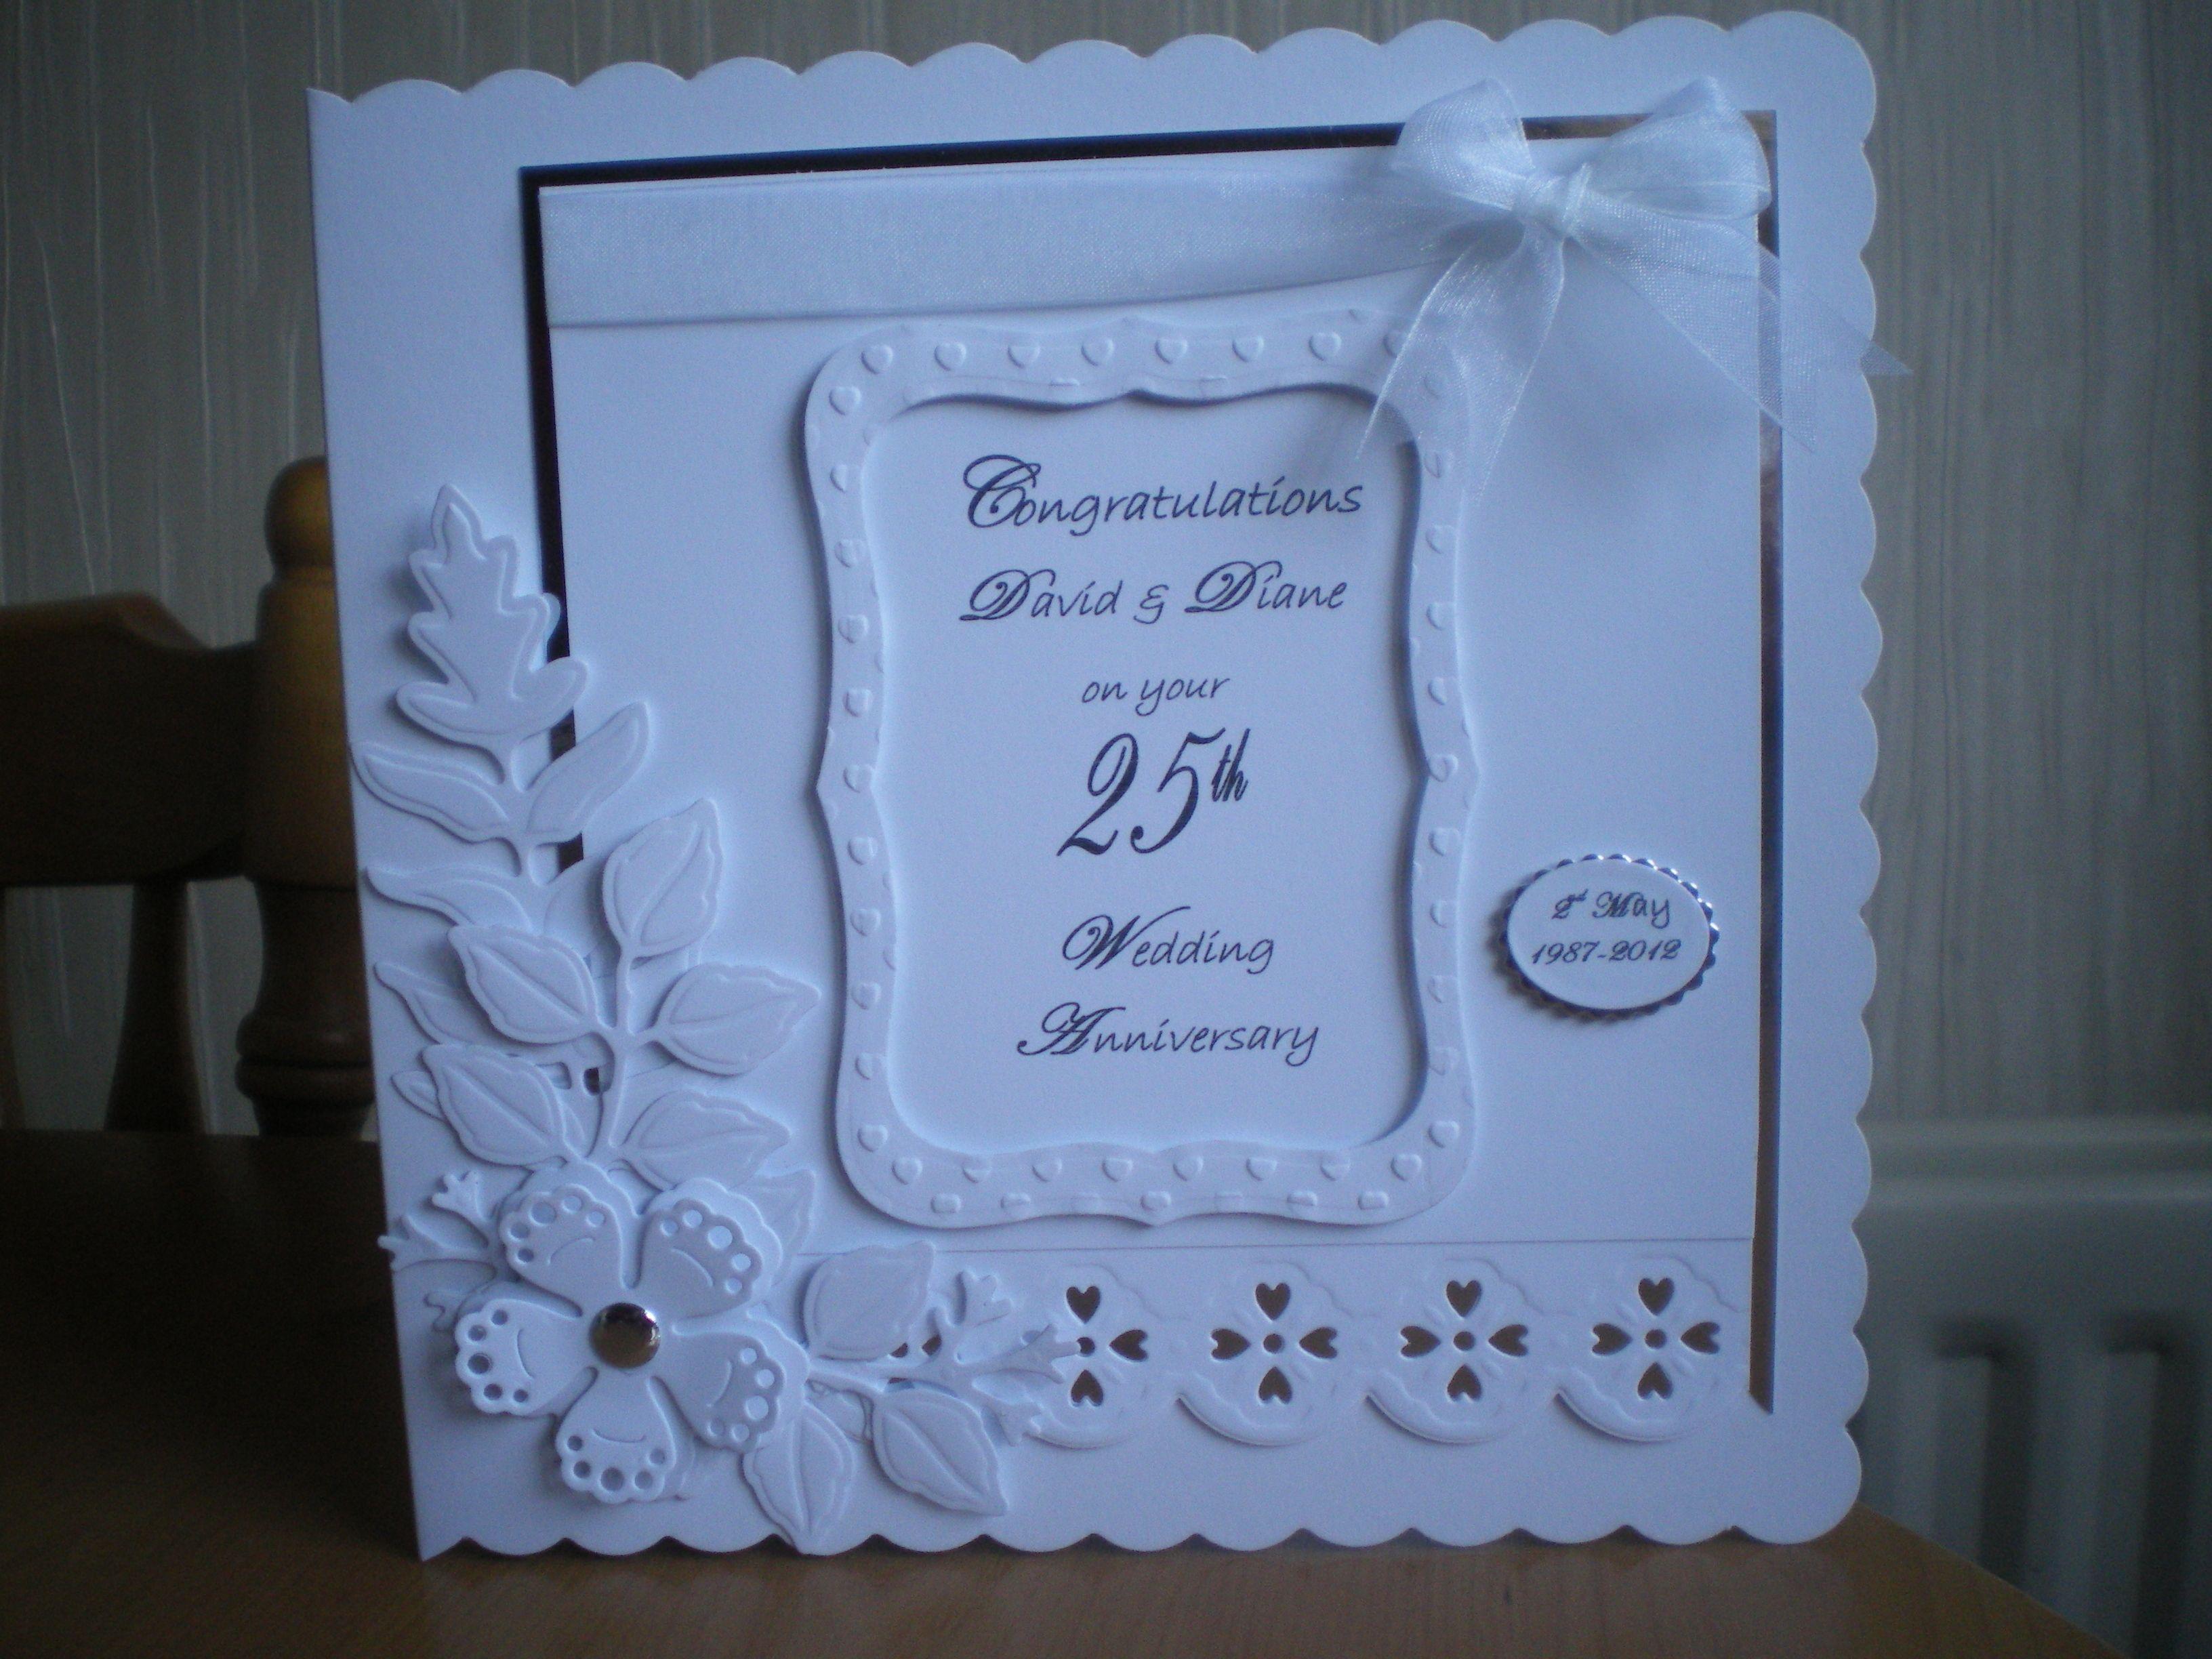 Th wedding anniversary cards pinterest